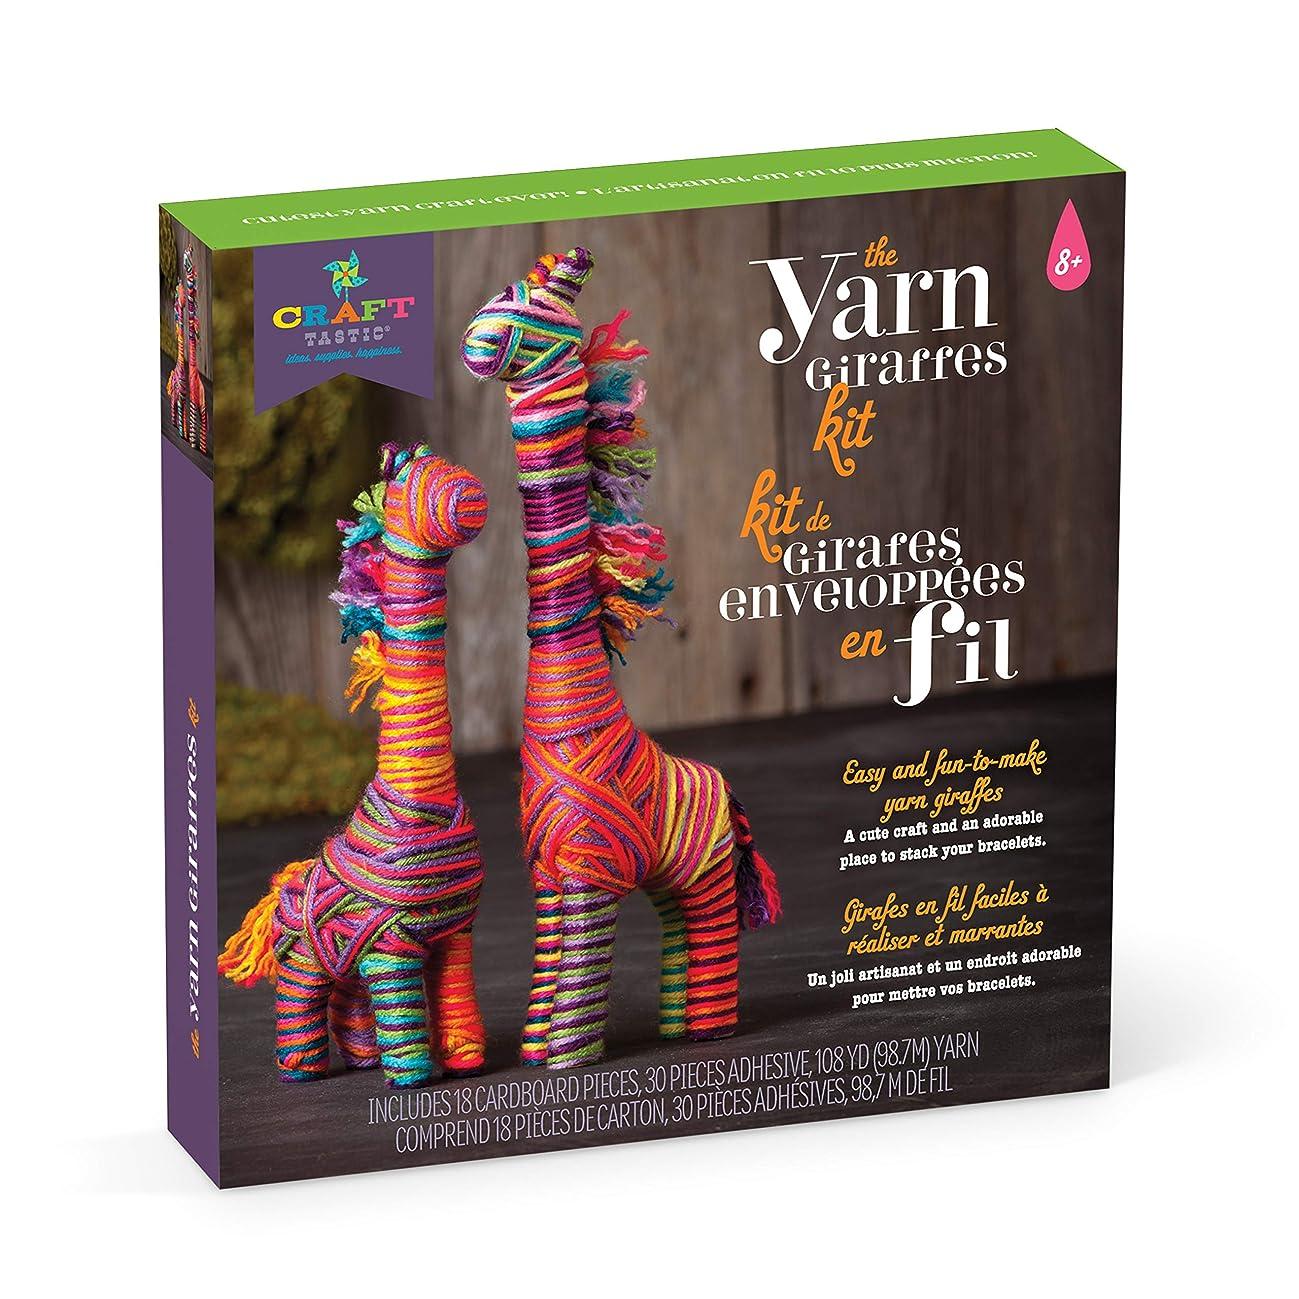 Craft-tastic – Yarn Giraffes Kit – Craft Kit Makes 2 Yarn-Wrapped Giraffes